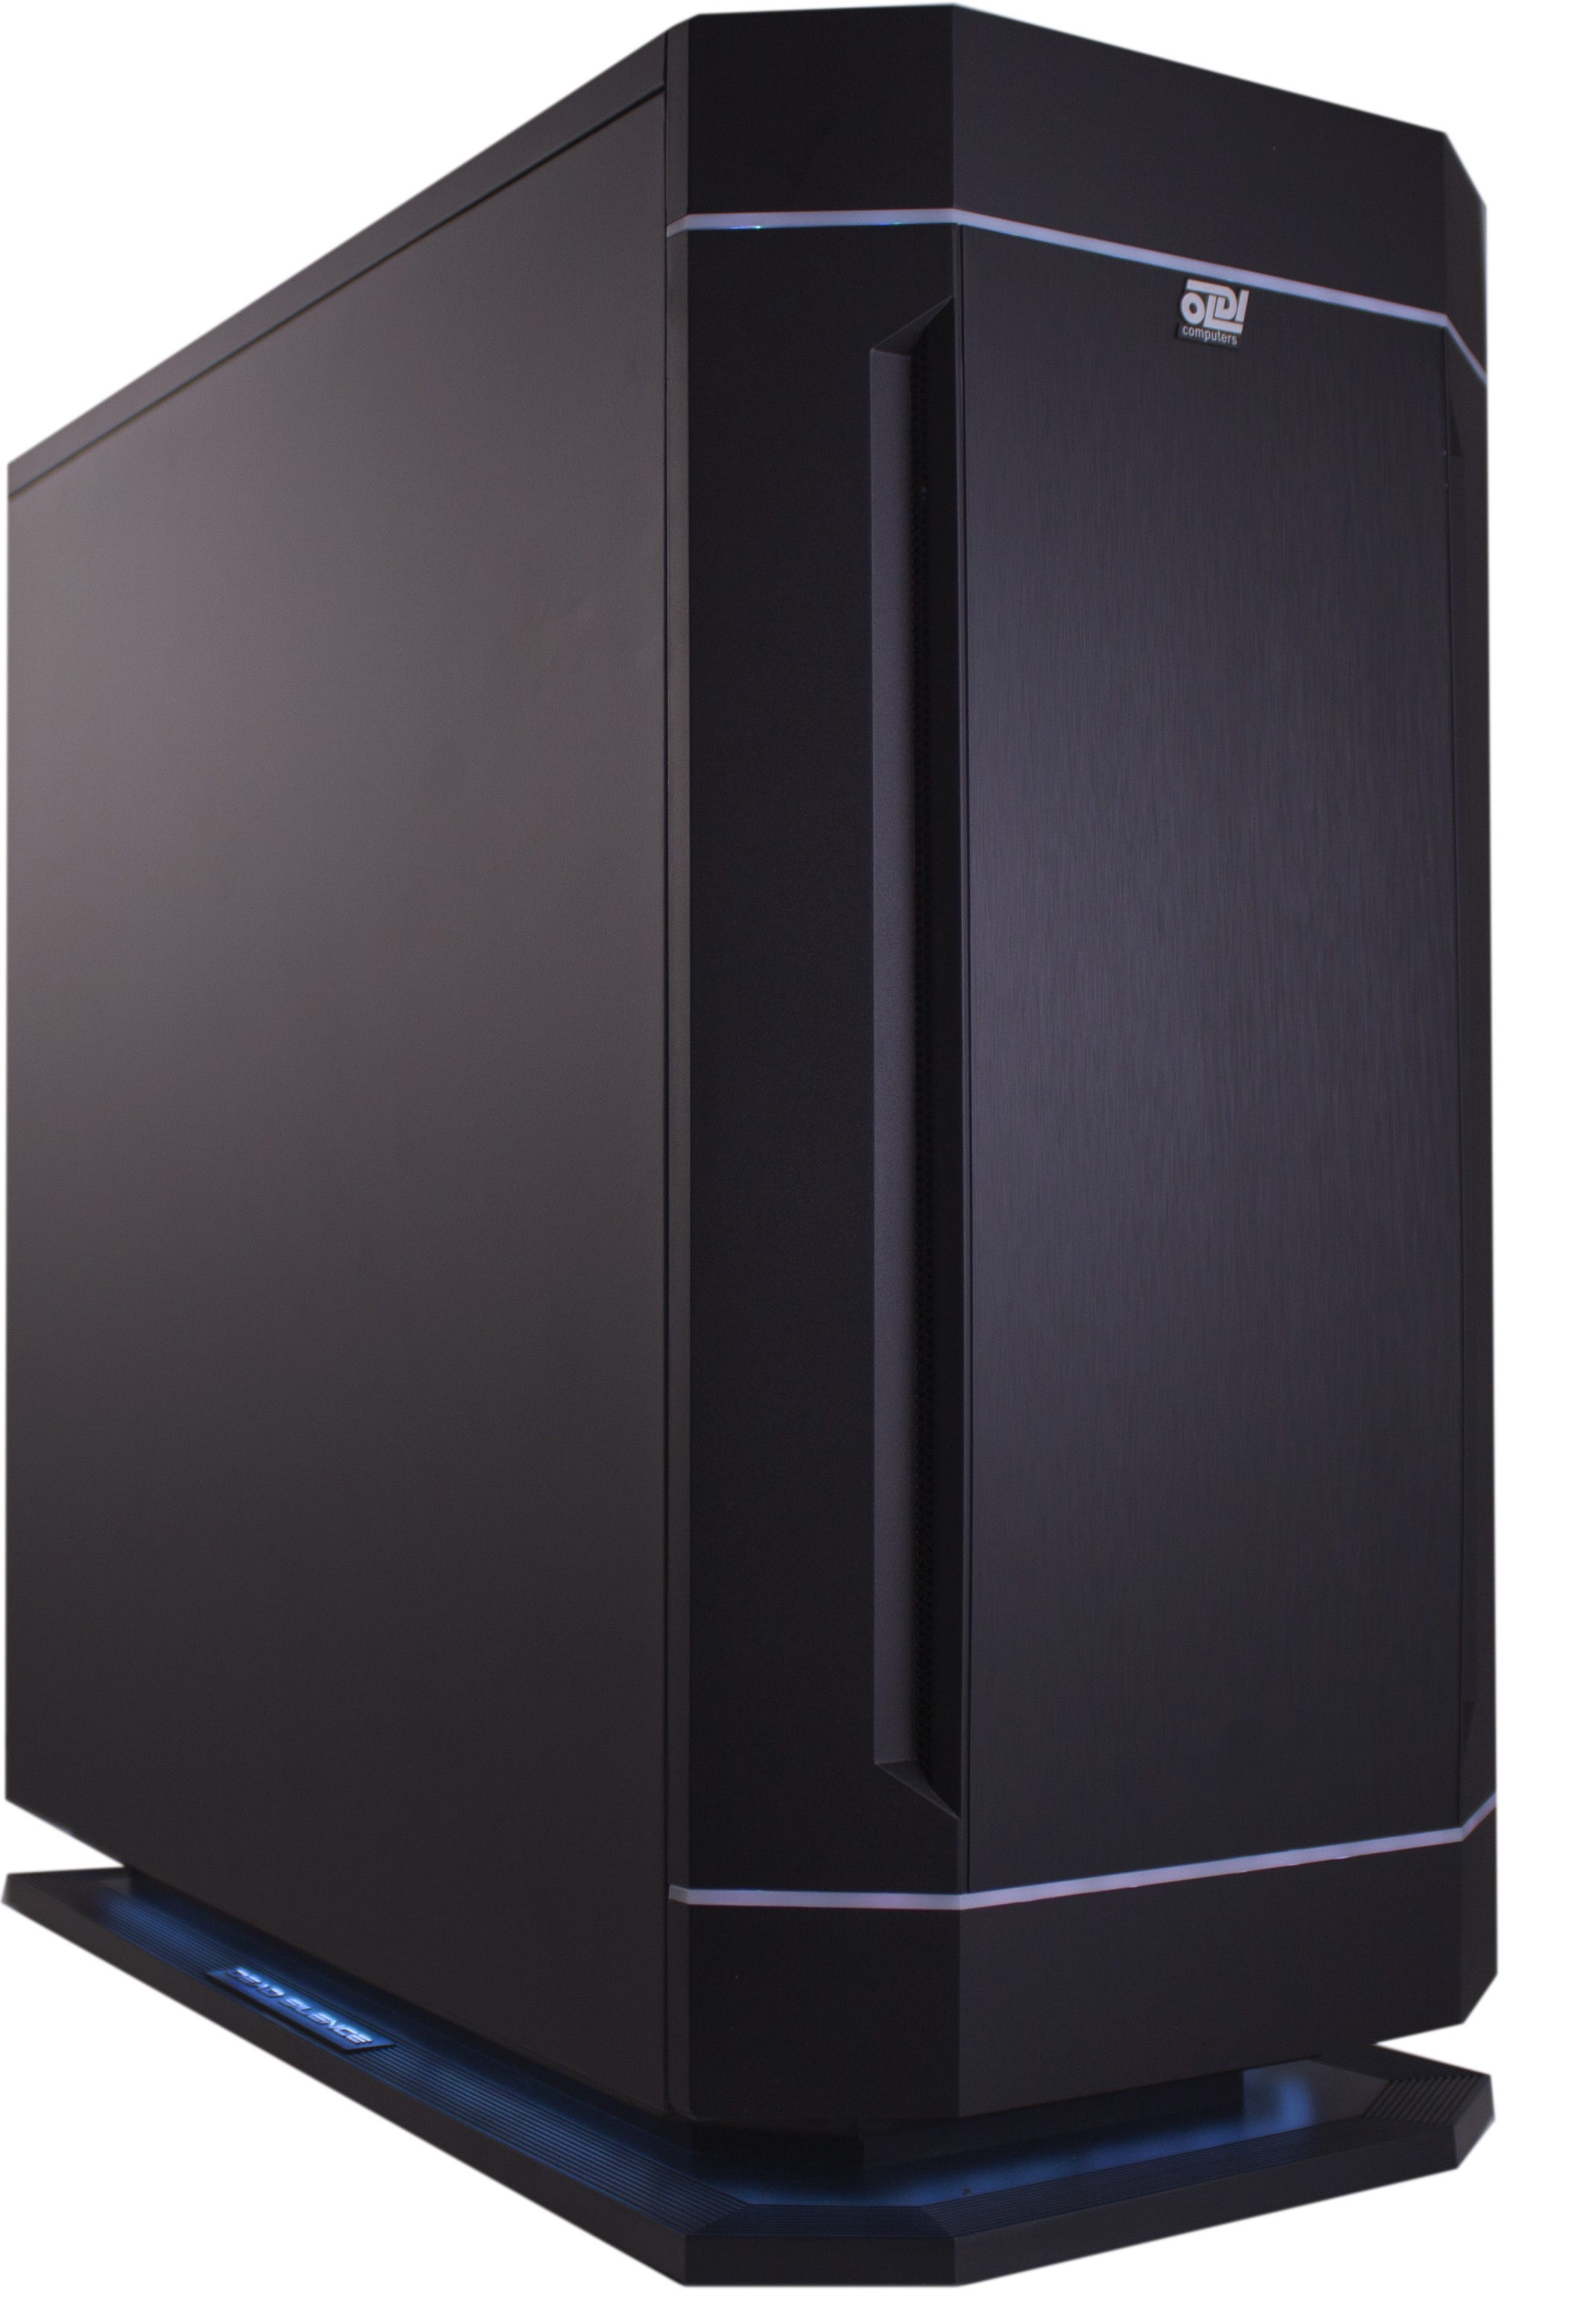 ПЭВМ PERSONAL GS 0644090 i7-8700K/Z370/32Gb/2*2Tb/512Gb SSD/8Gb P4000/700W/WIN10 Pro 64-bit msi original zh77a g43 motherboard ddr3 lga 1155 for i3 i5 i7 cpu 32gb usb3 0 sata3 h77 motherboard